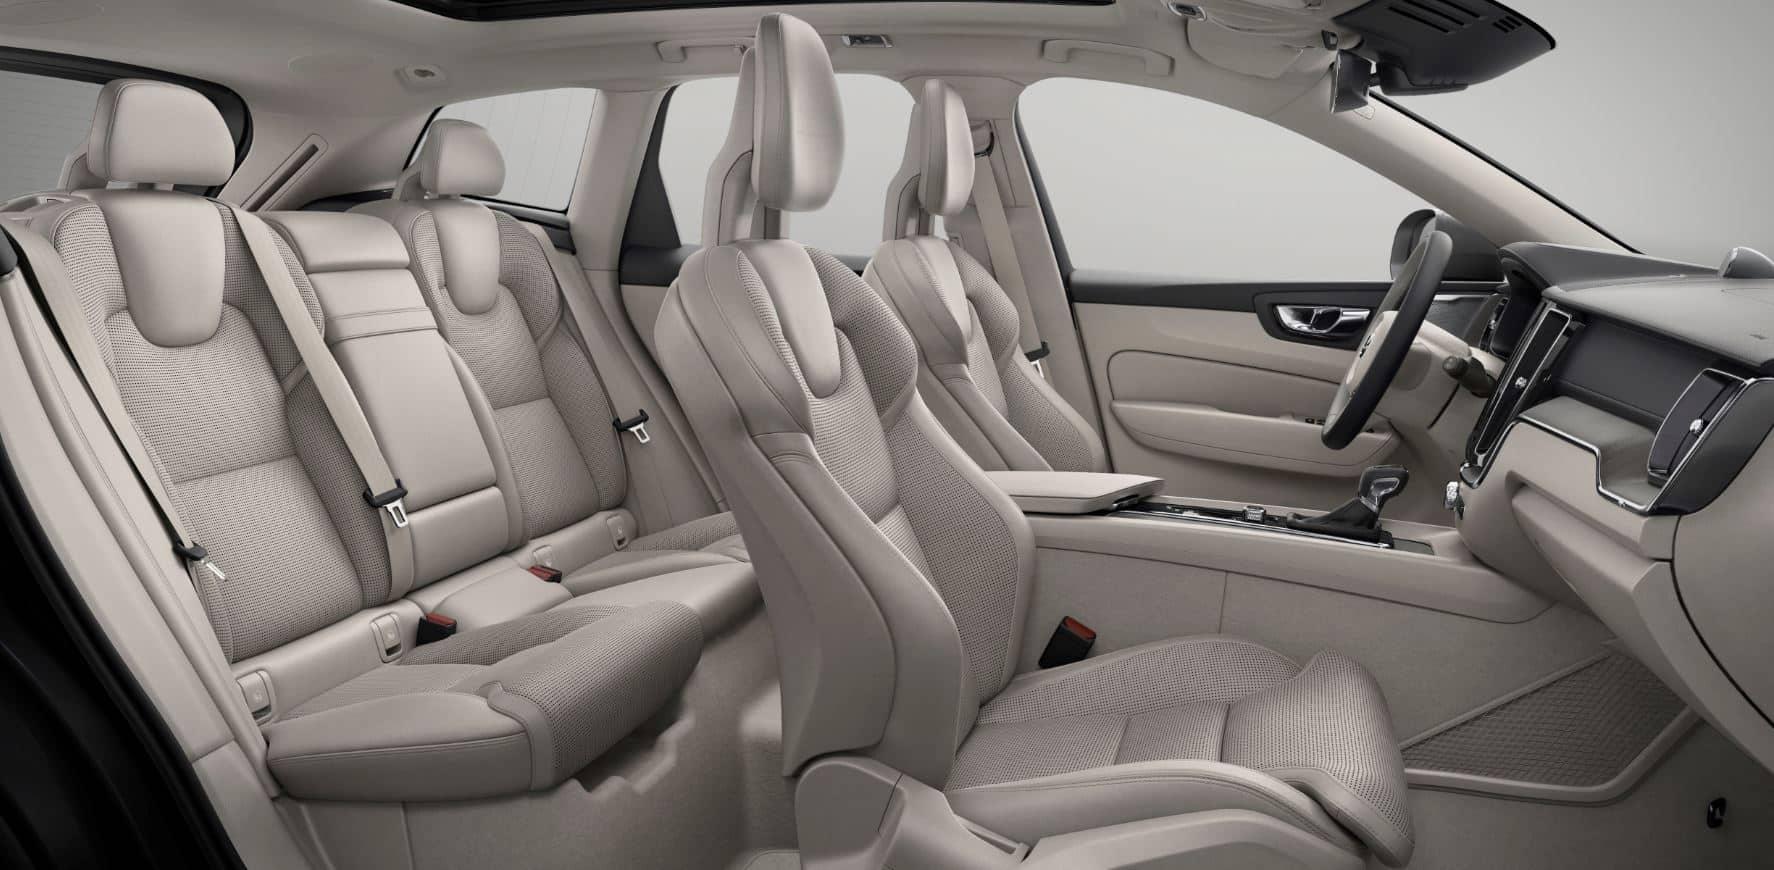 Nuevo Volvo XC60 18